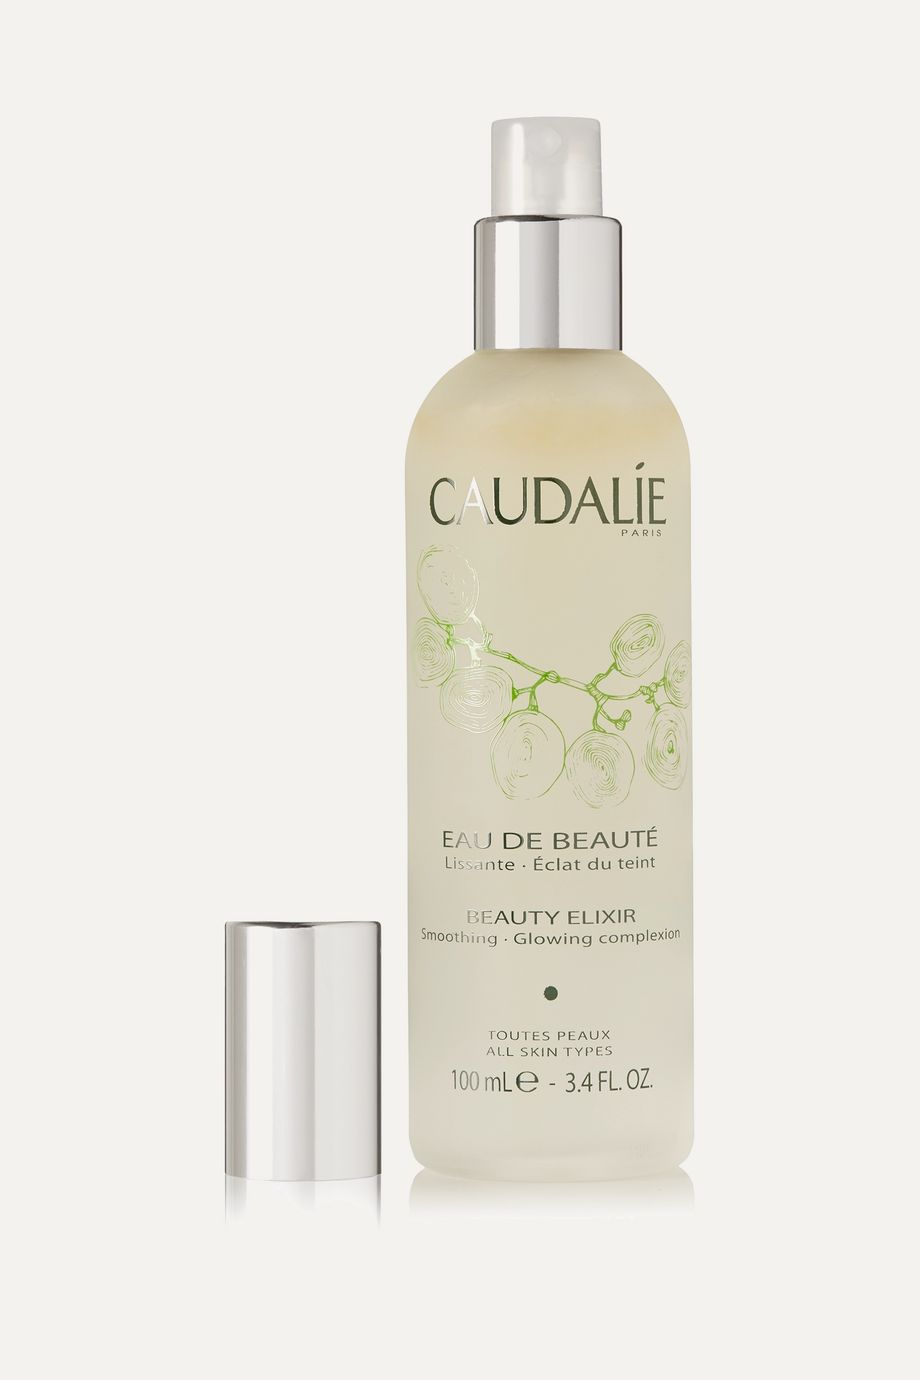 Caudalie Beauty Elixir, 100ml